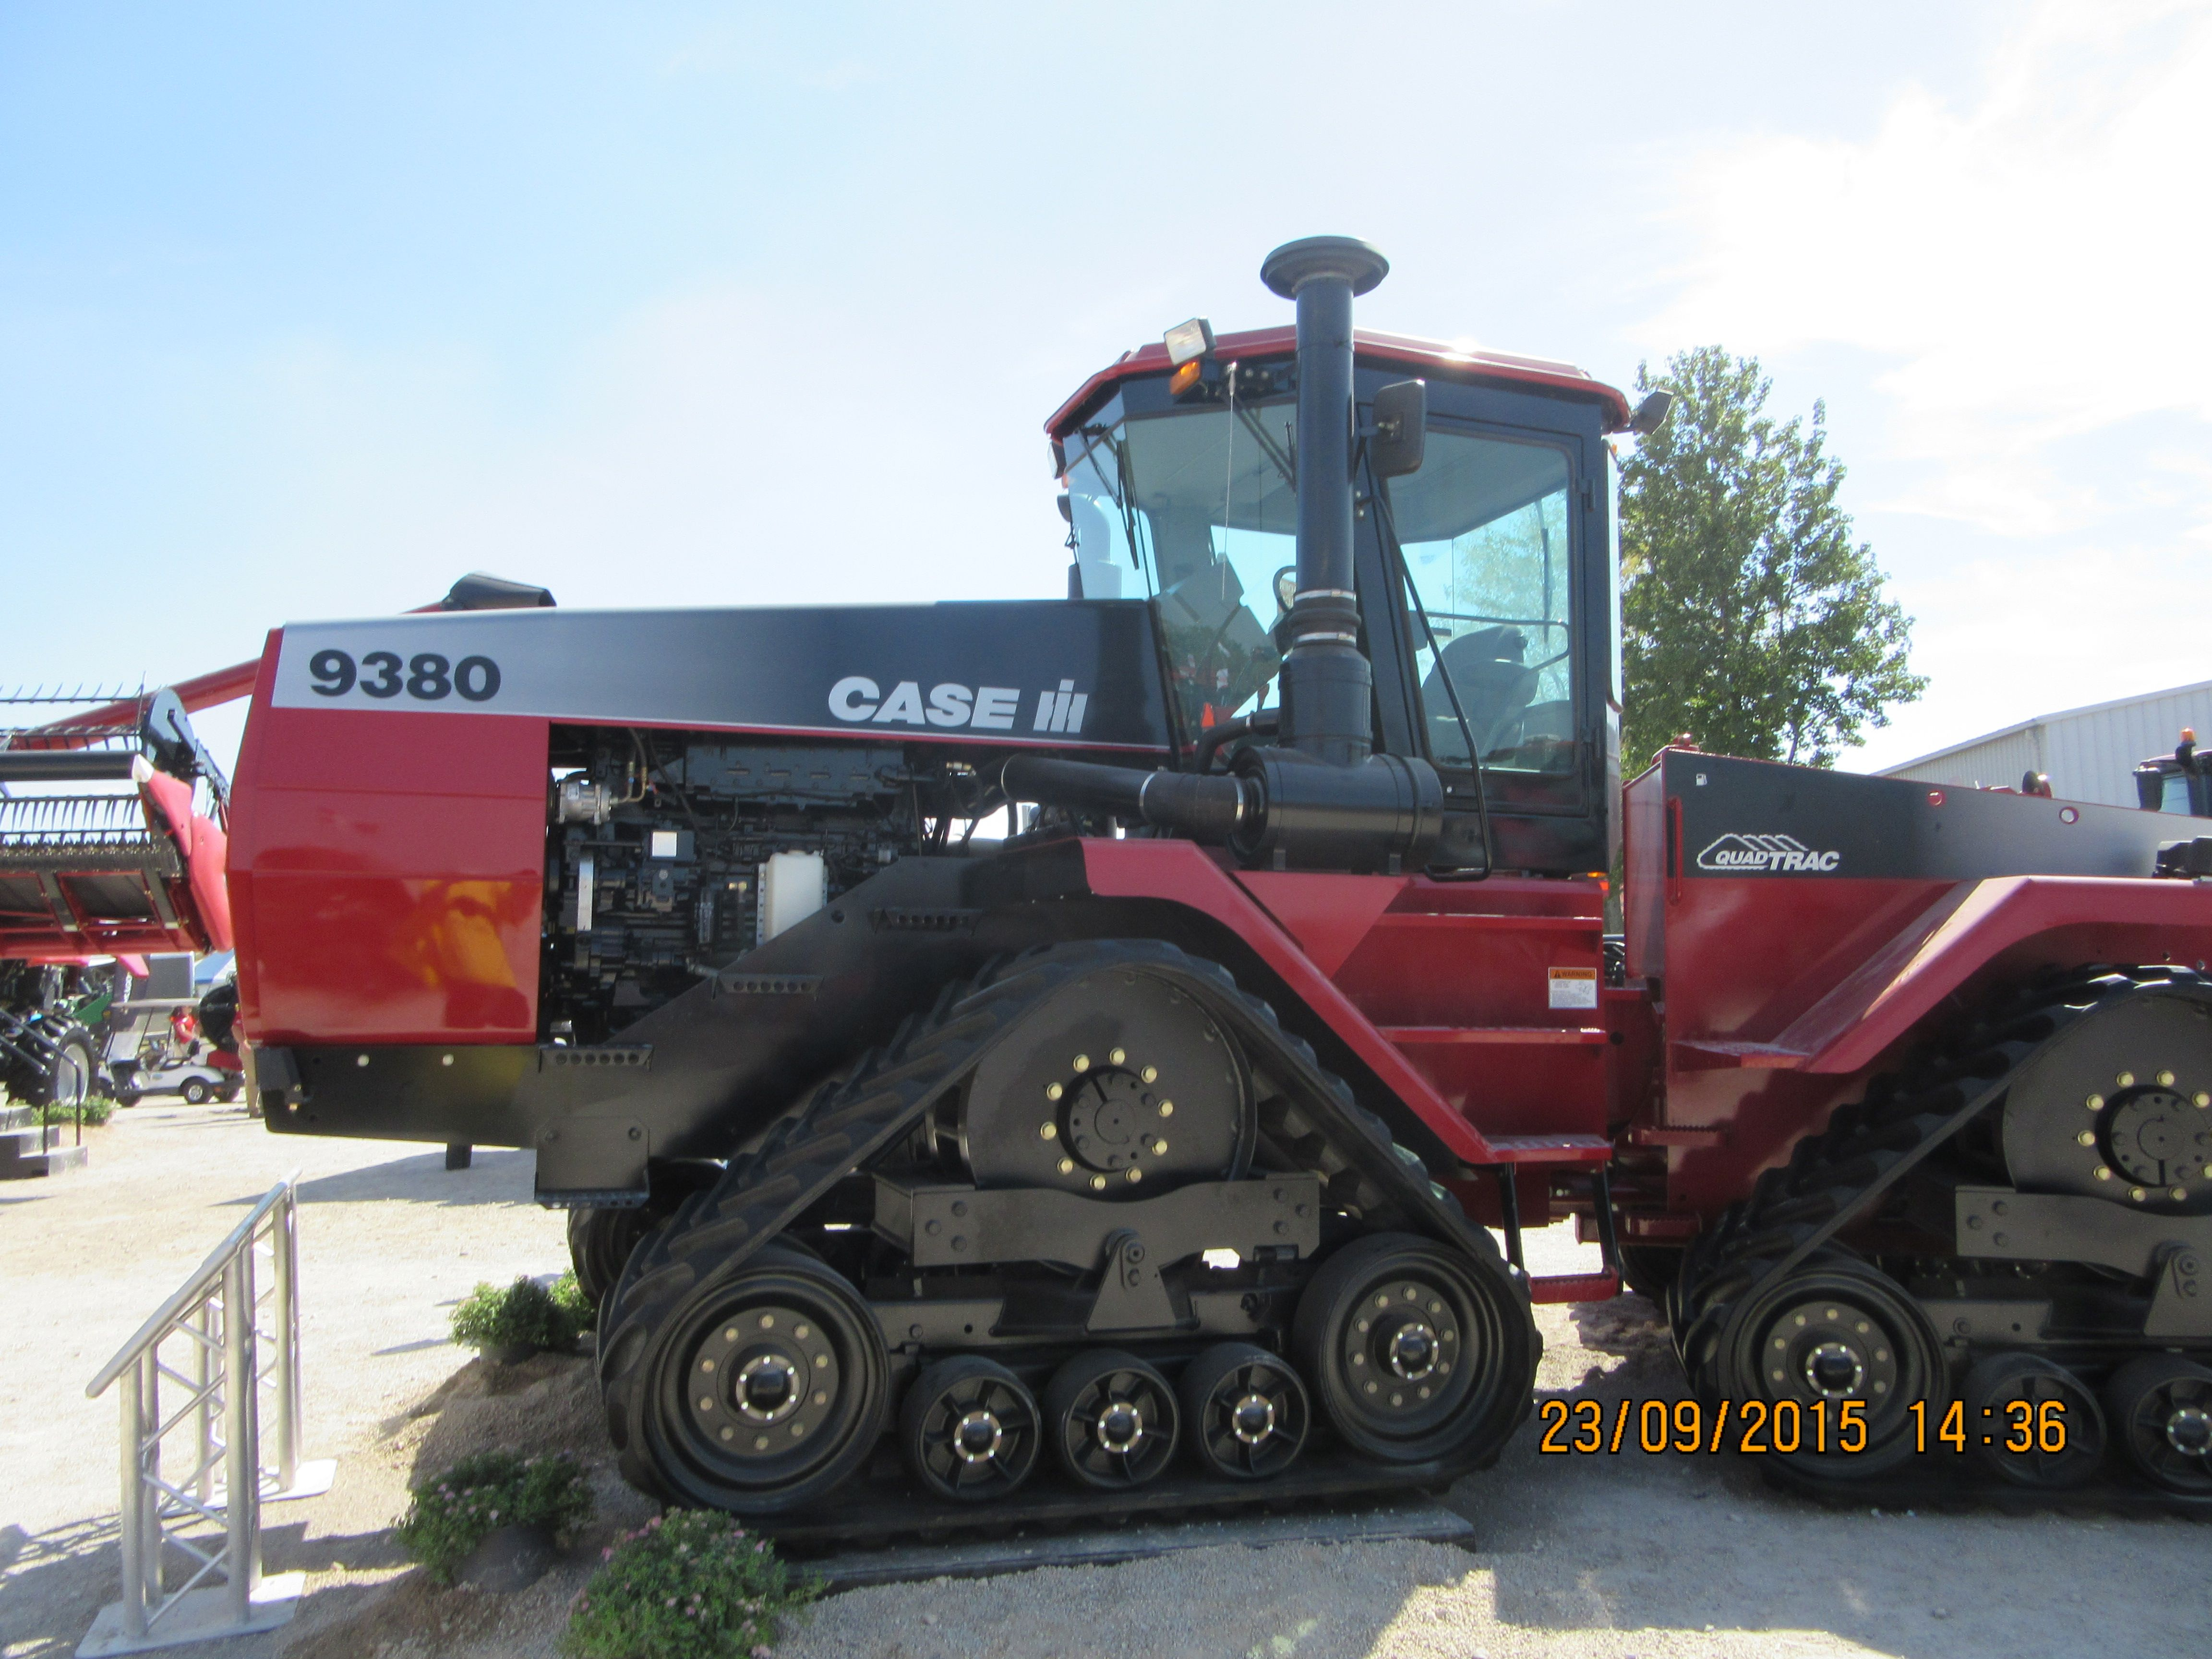 hight resolution of caseih steiger 9380 quadtrac case ih tractors big tractors international harvester down on